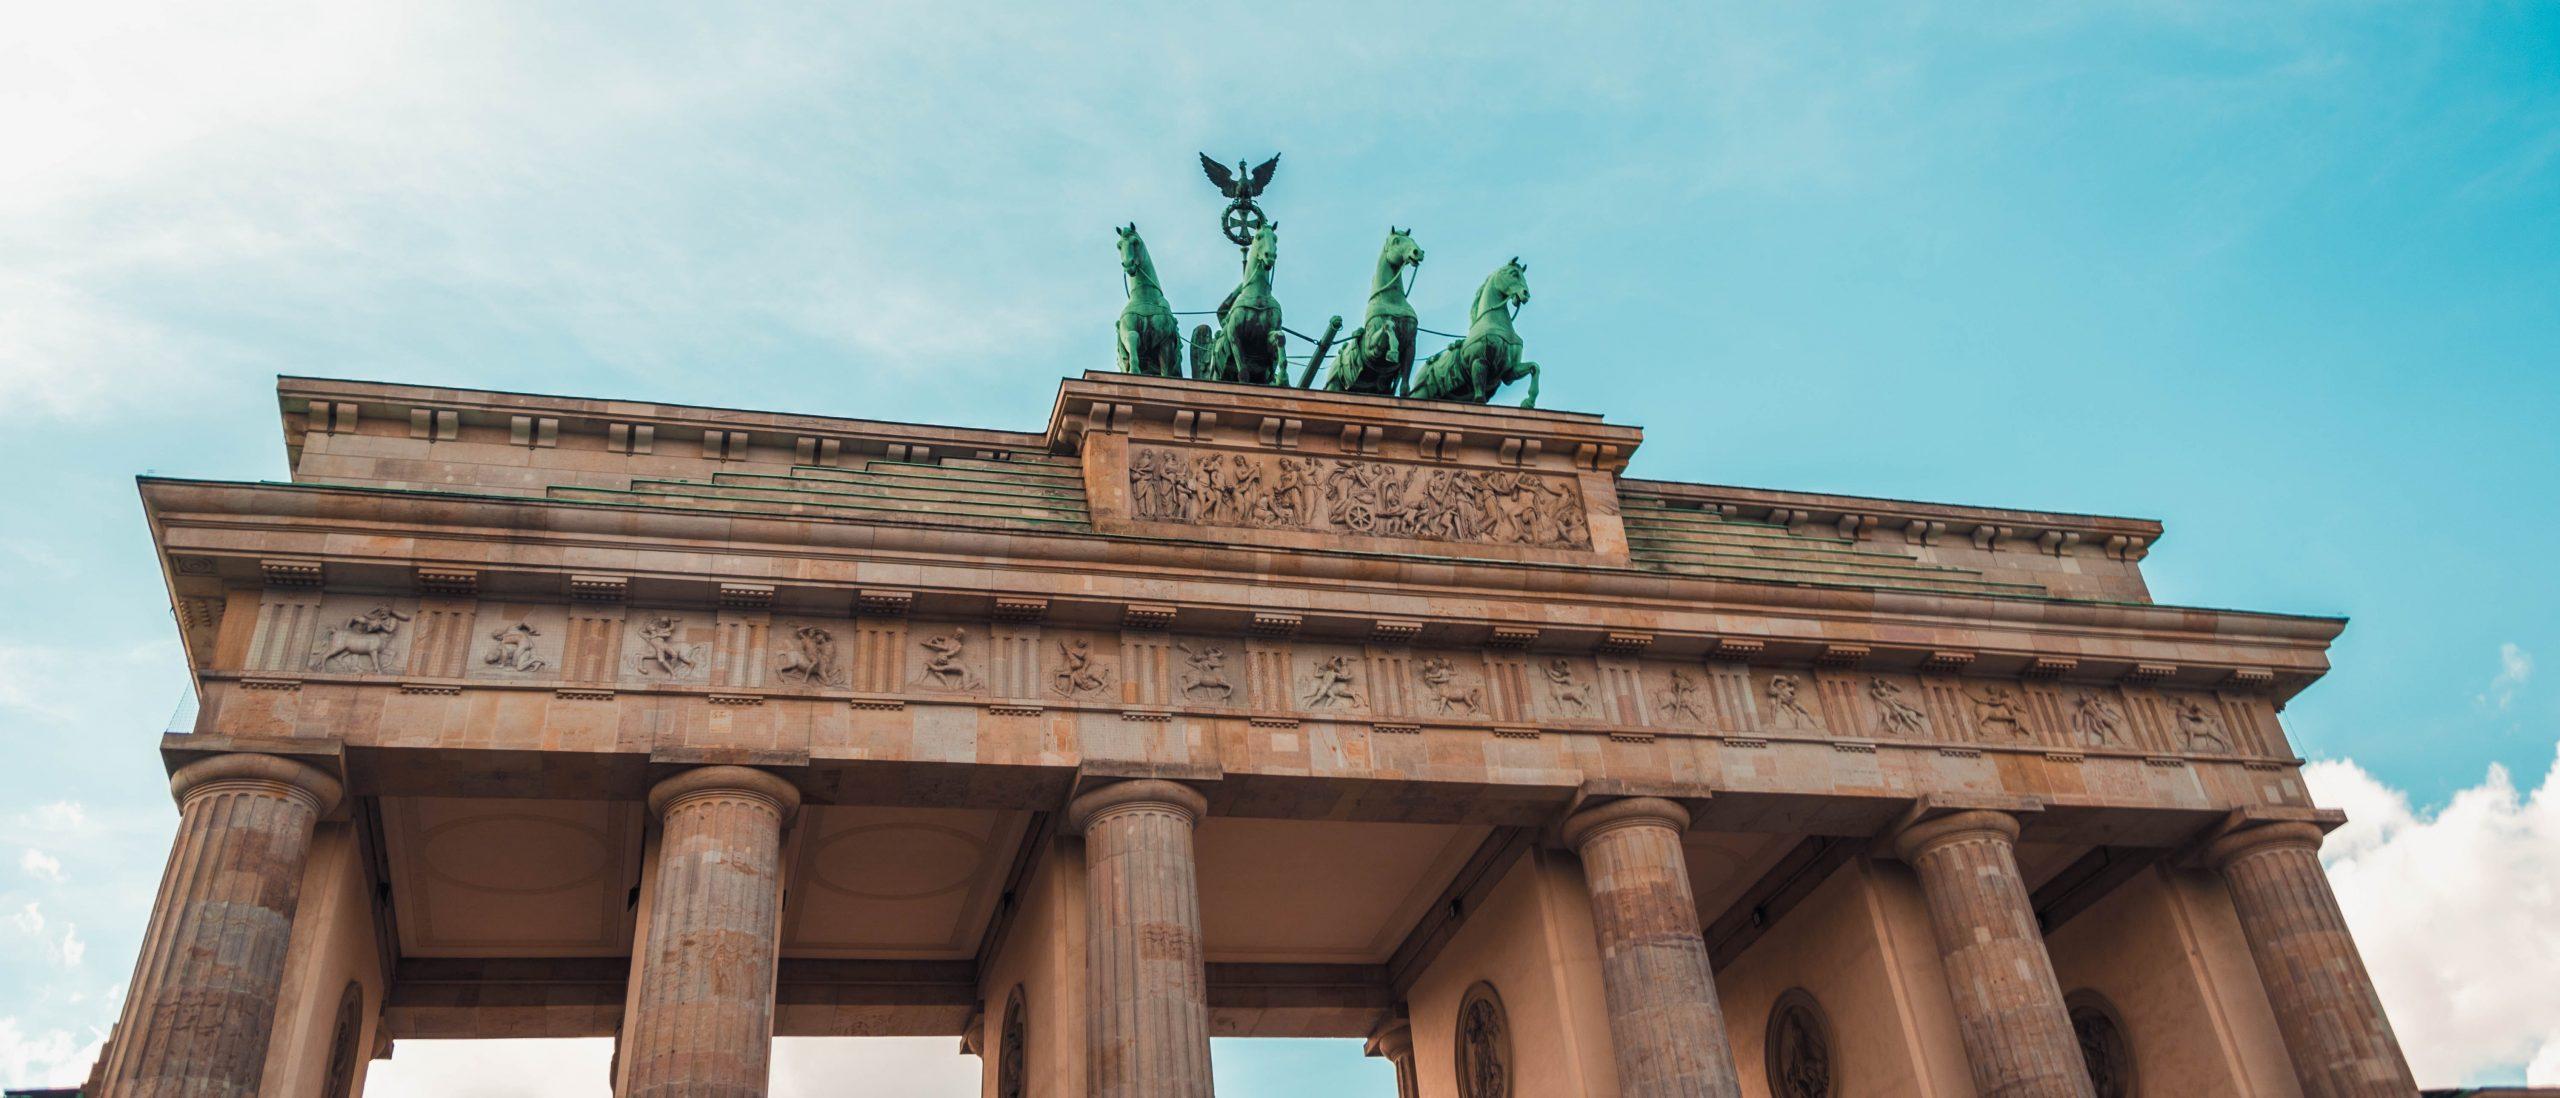 Delegation Berlin